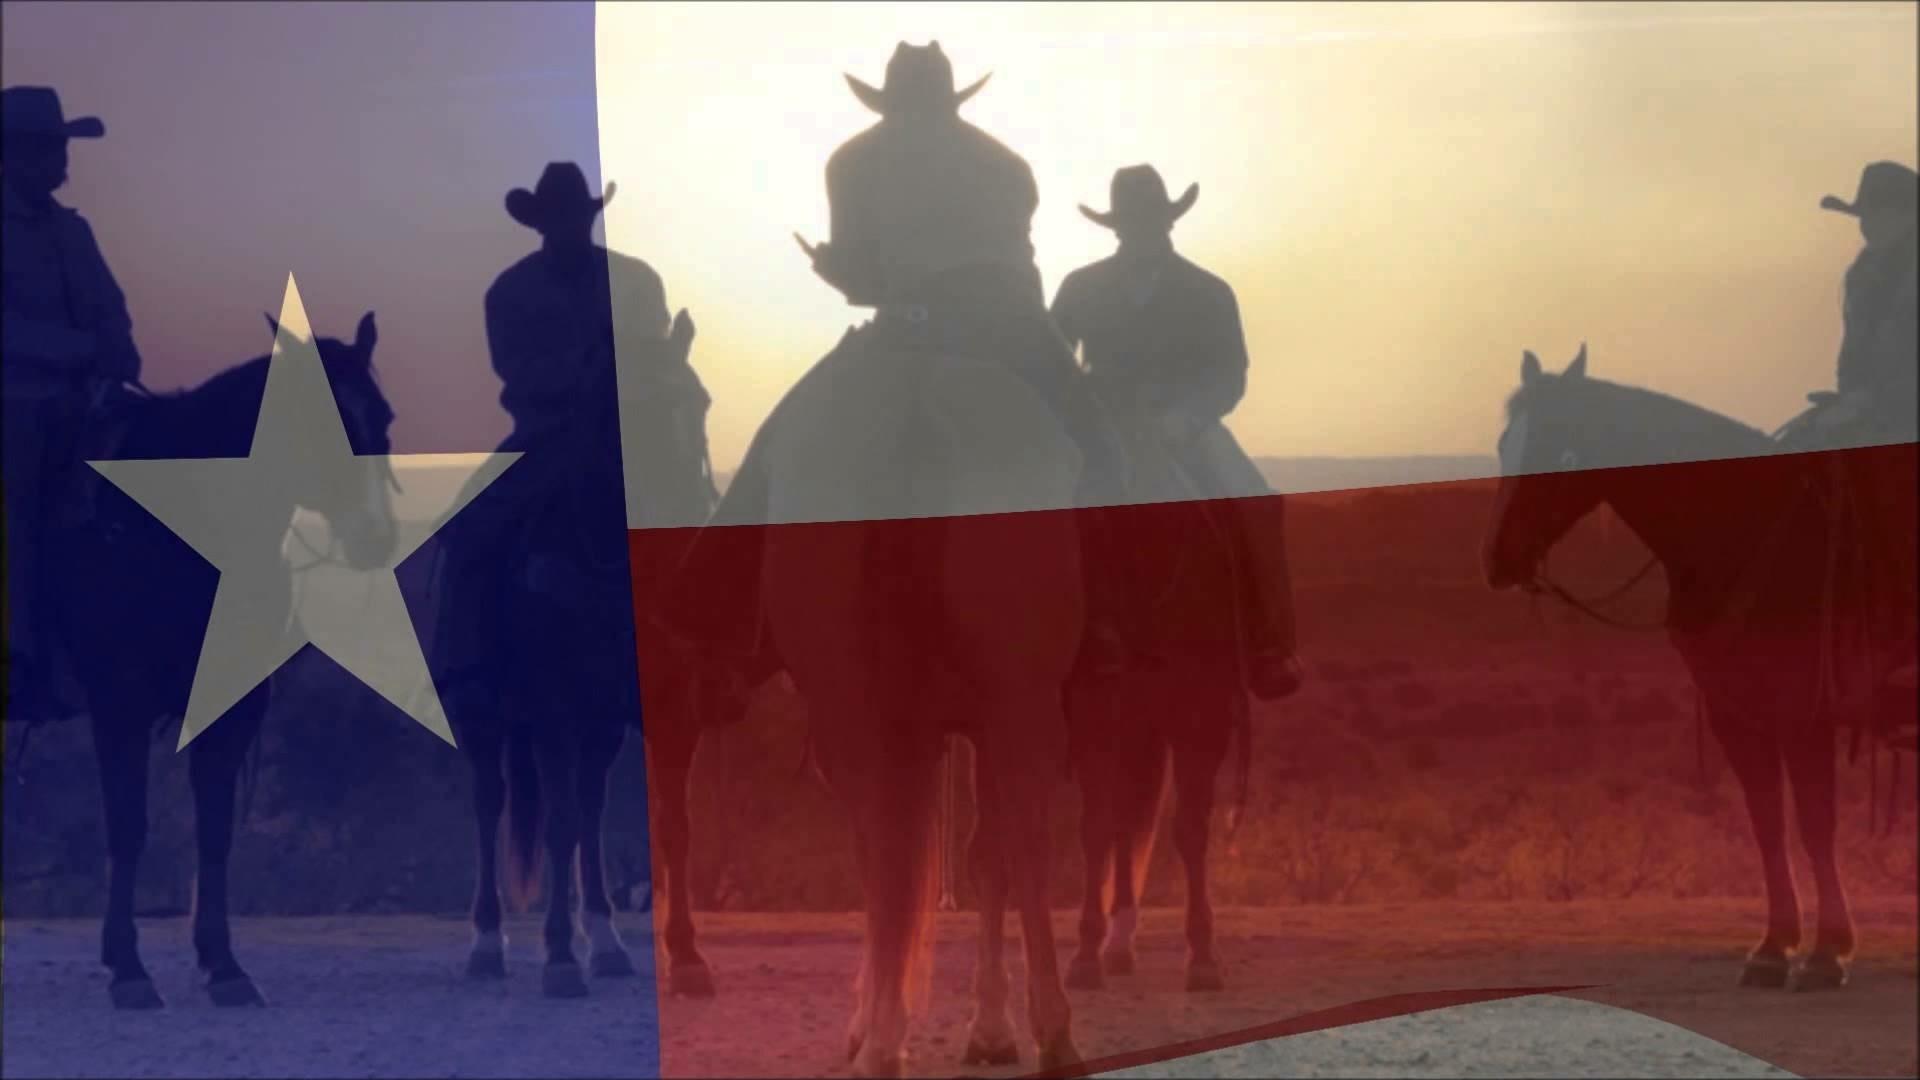 Hd texas flag wallpaper 60 images - Texas flag wallpaper ...